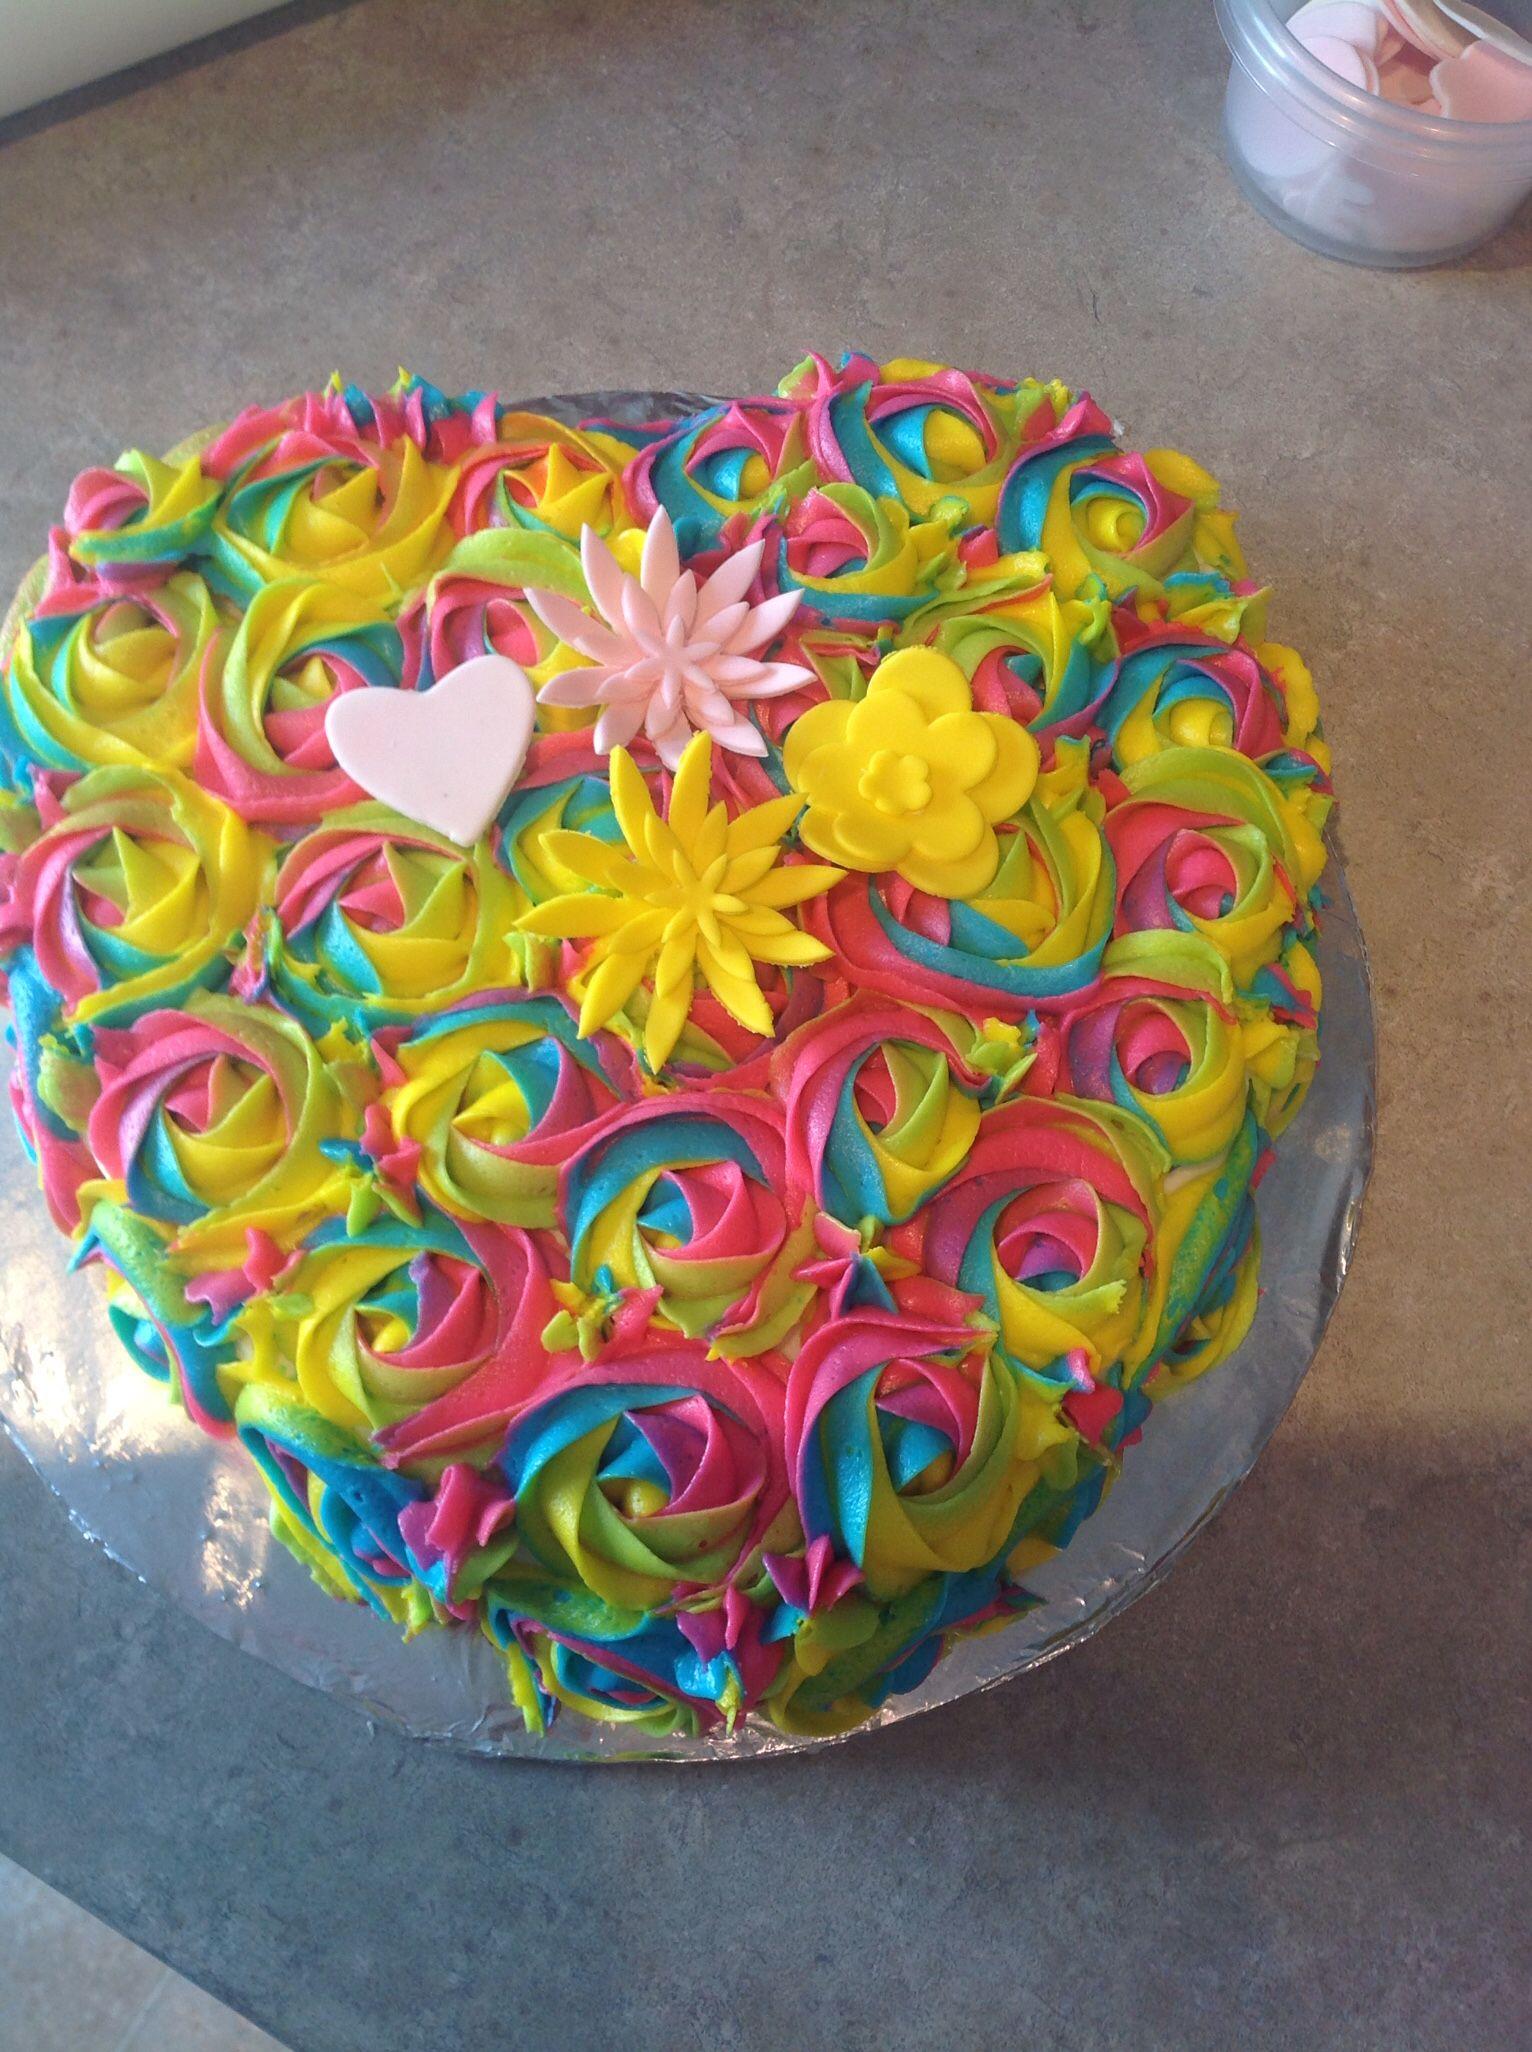 Vanilla Bean tie dye cake with rosettes in 2019 | Tie dye ...